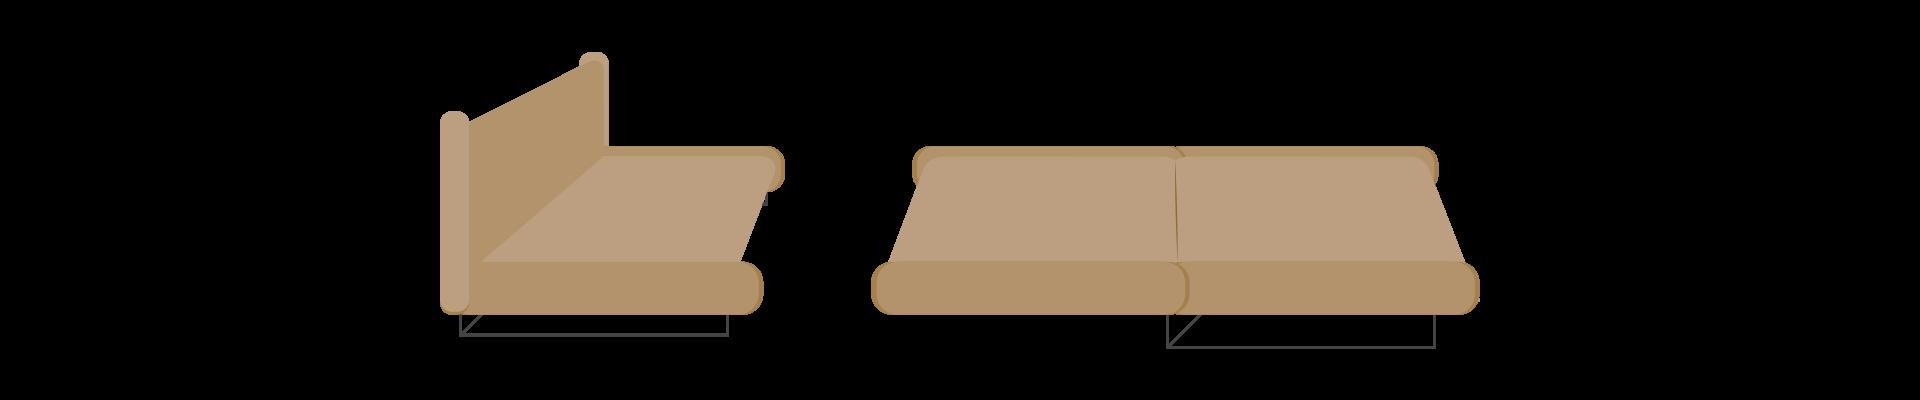 Jacknife Sofa